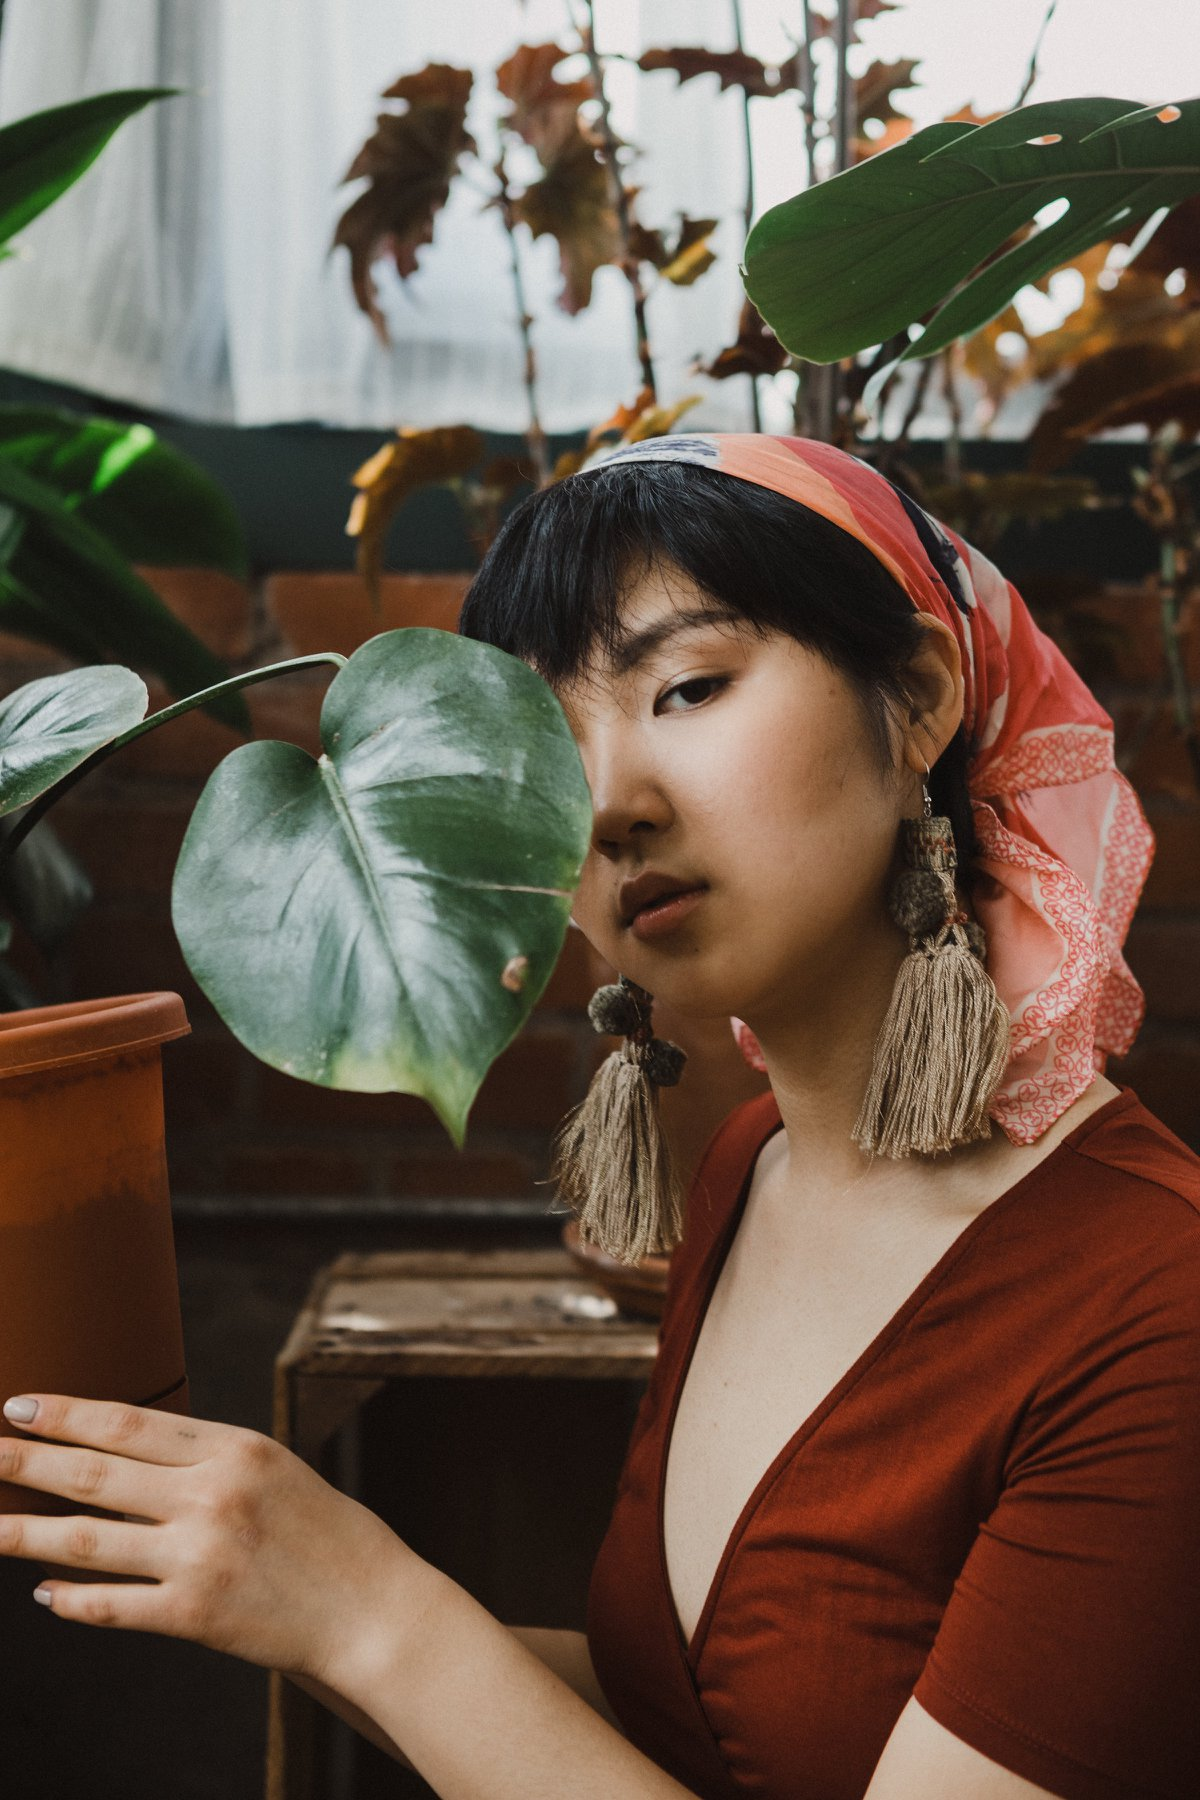 fashion photography street style kansas city missouri plant portrait